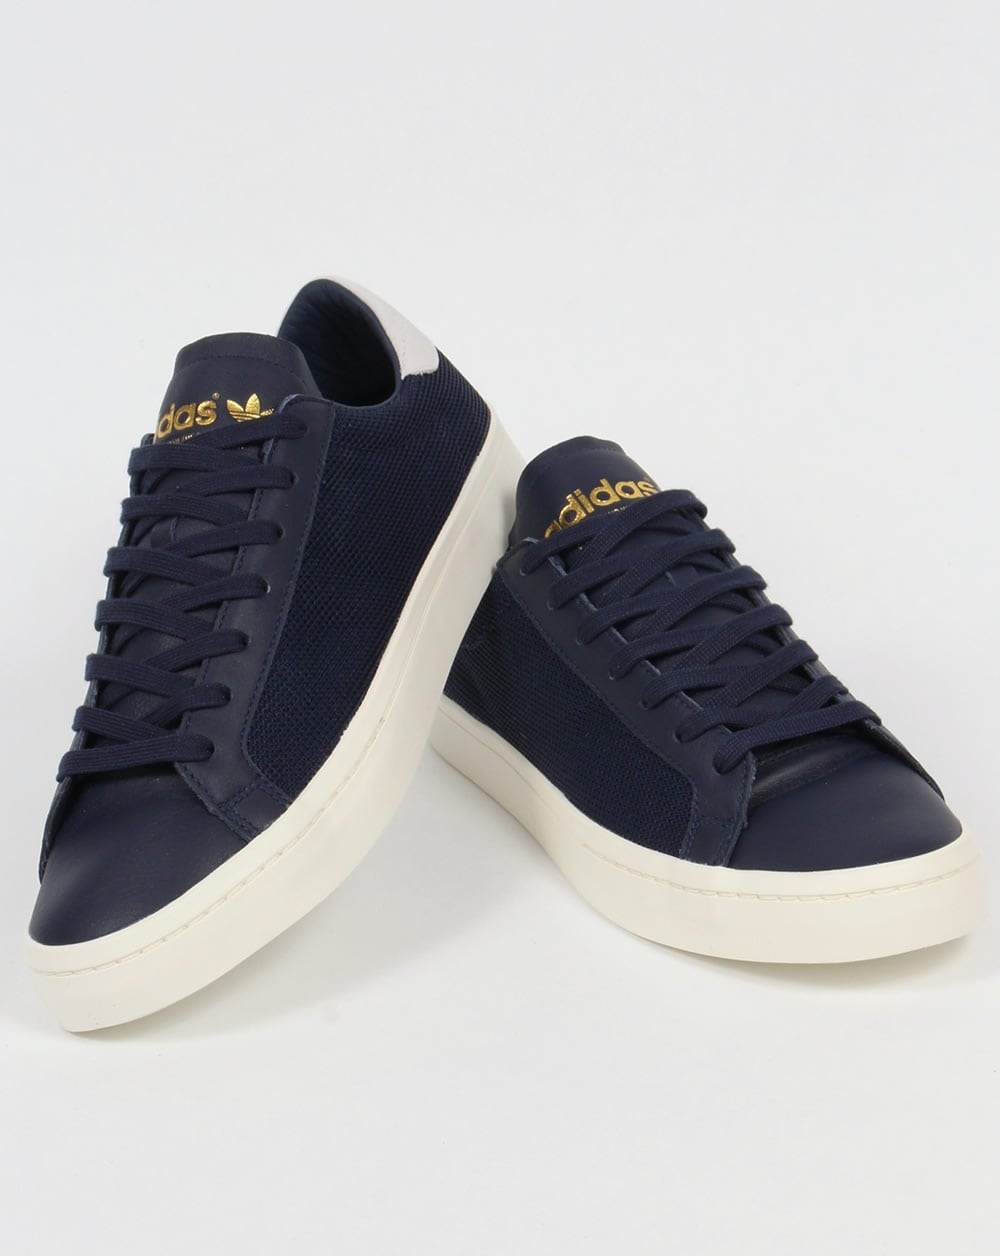 Adidas Originals Court Vantage Trainers Navy,shoes,low top ... Caterpillar Shoes